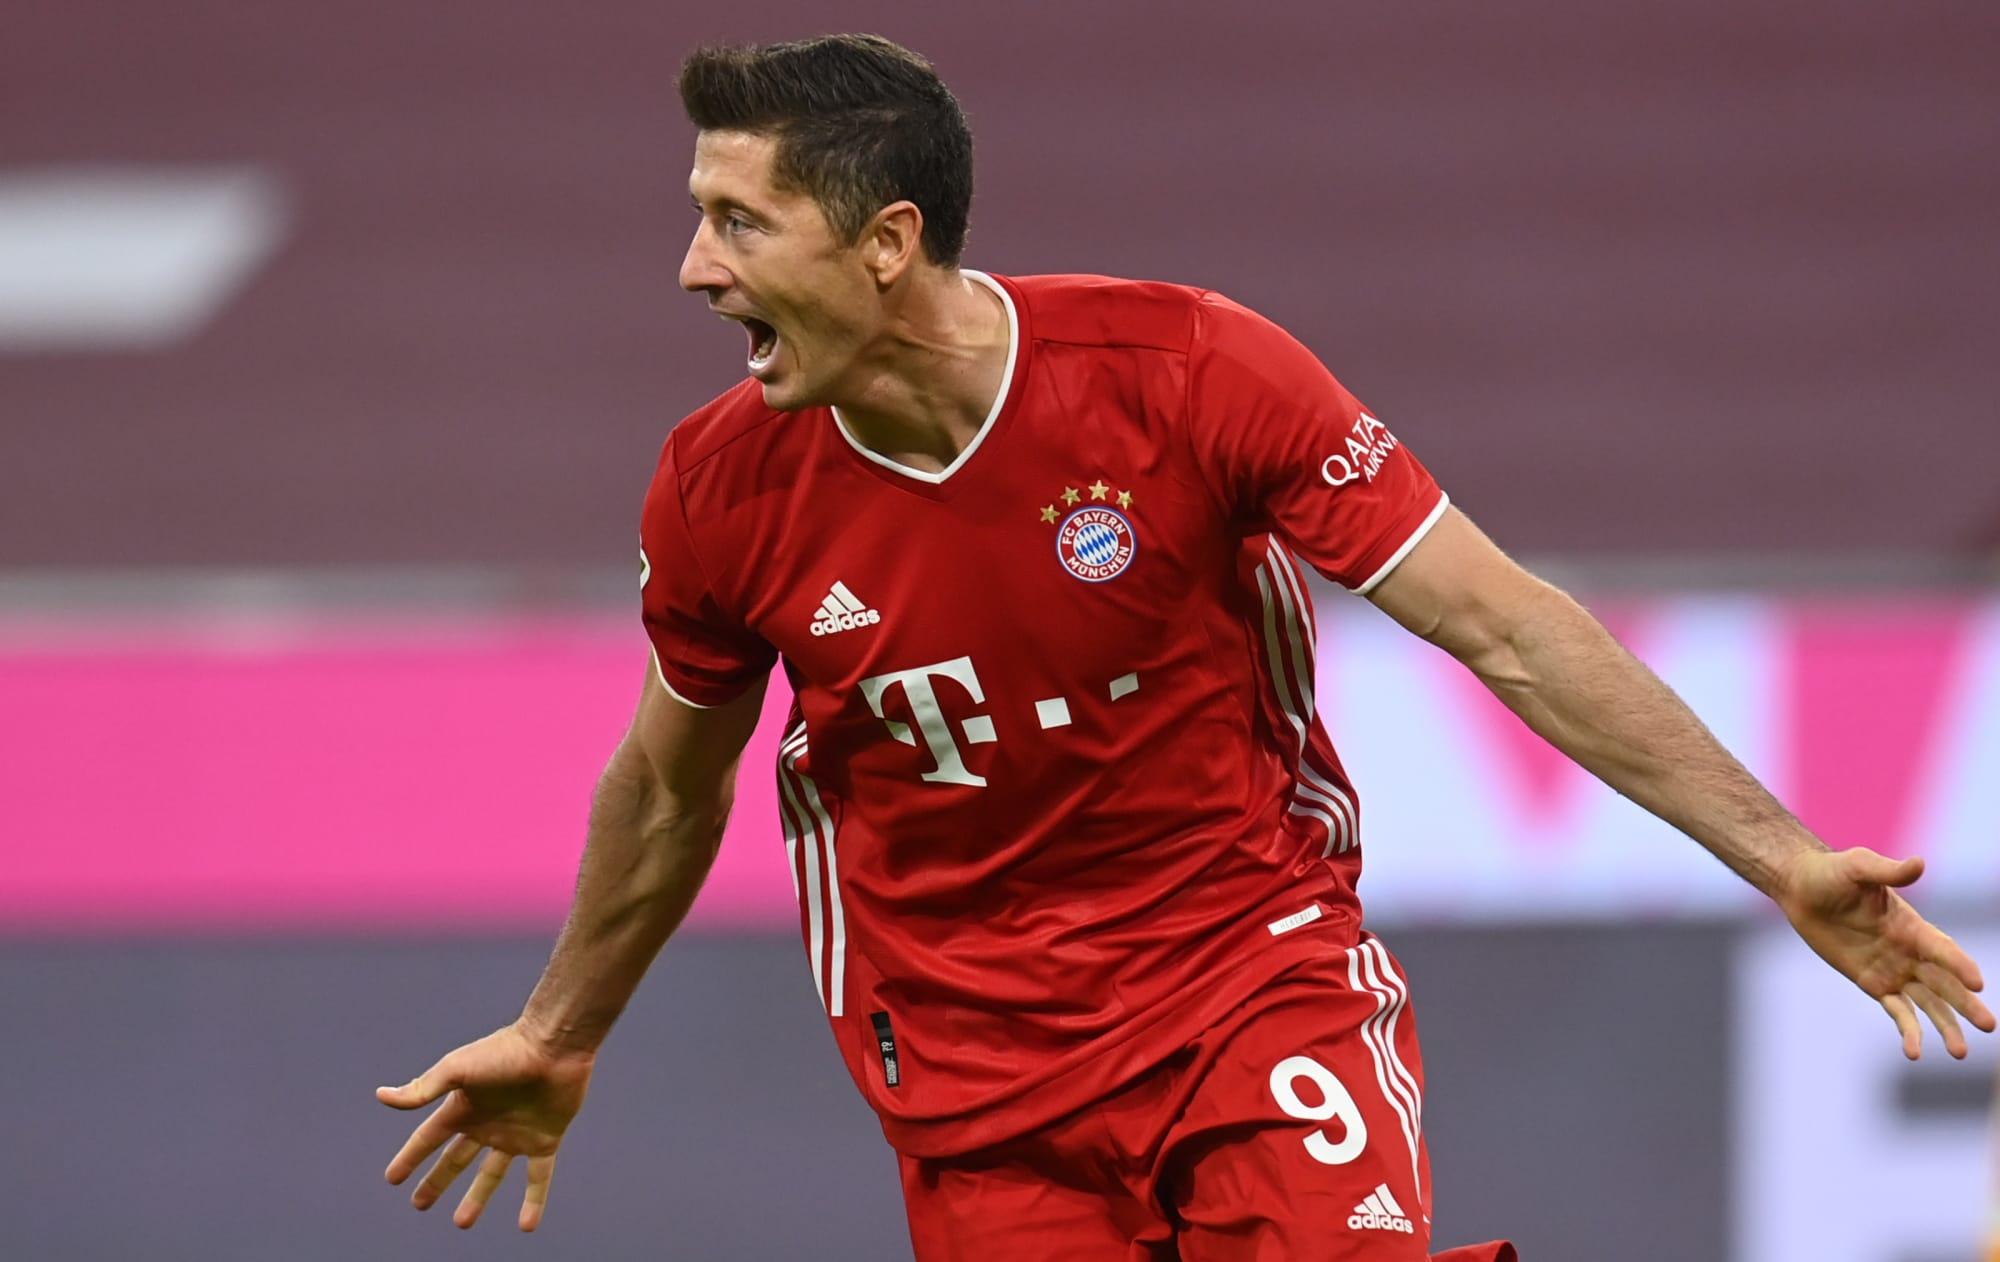 FC Bayern Munich Robert Lewandowski Delivers Another